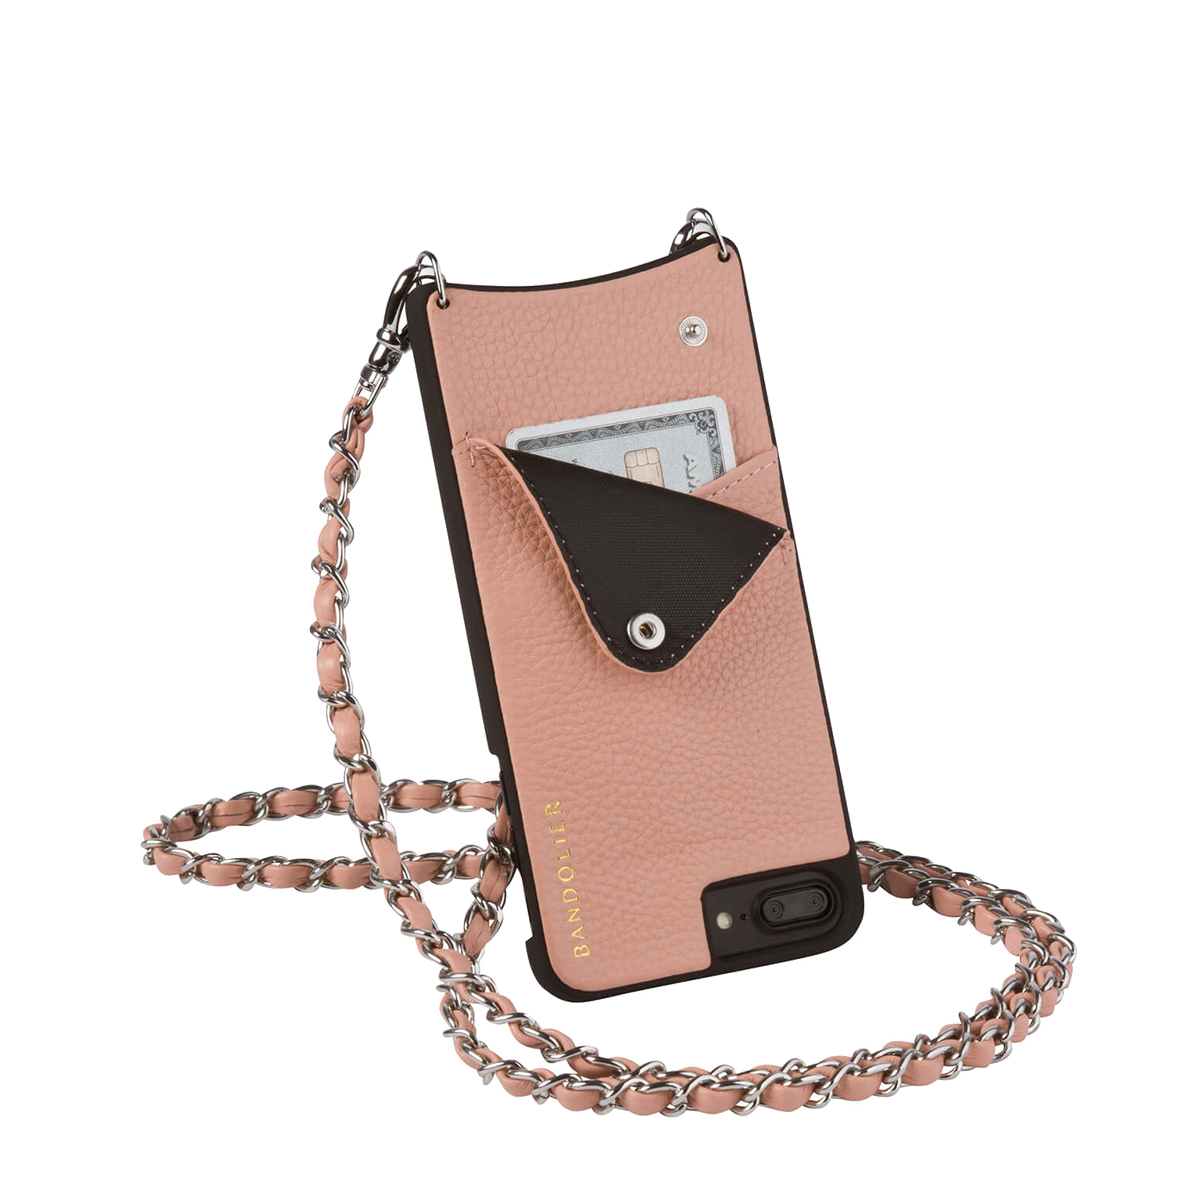 BANDOLIER iPhone8 iPhone7 6s LUCY BLUSH バンドリヤー ケース スマホ アイフォン メンズ レディース [1812]